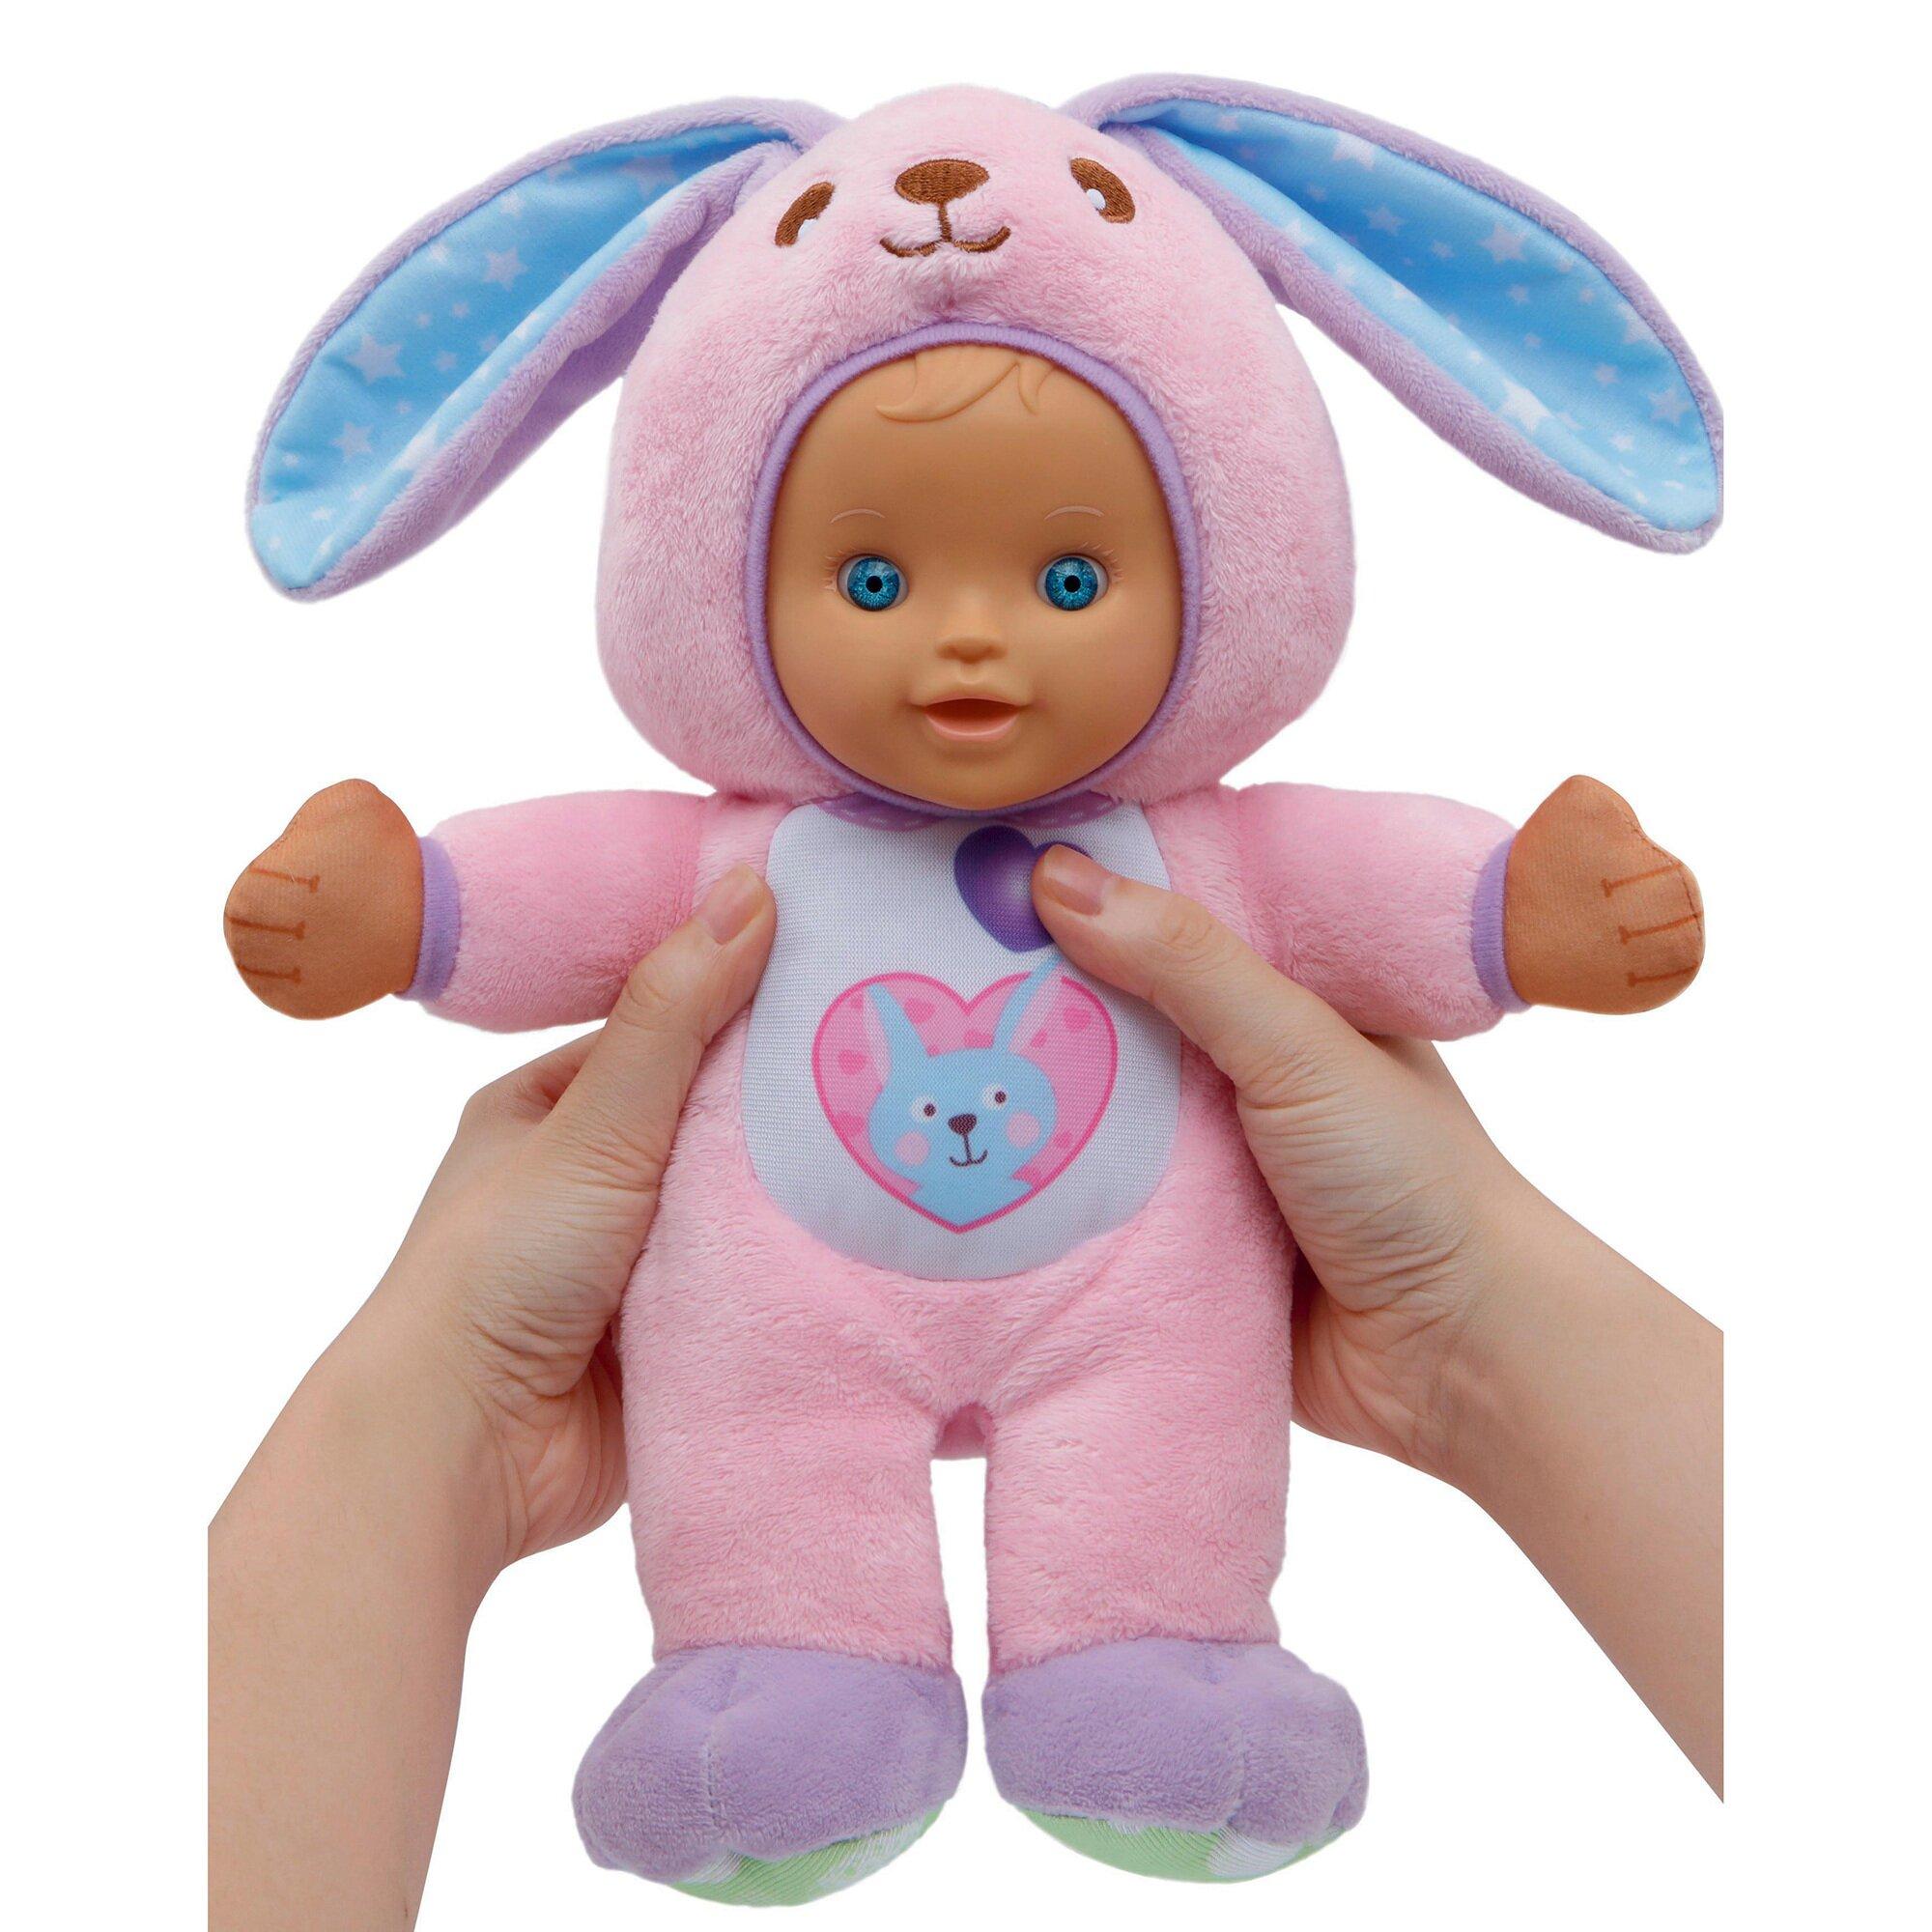 little-love-puppe-hannah-mit-funktionen-23-cm